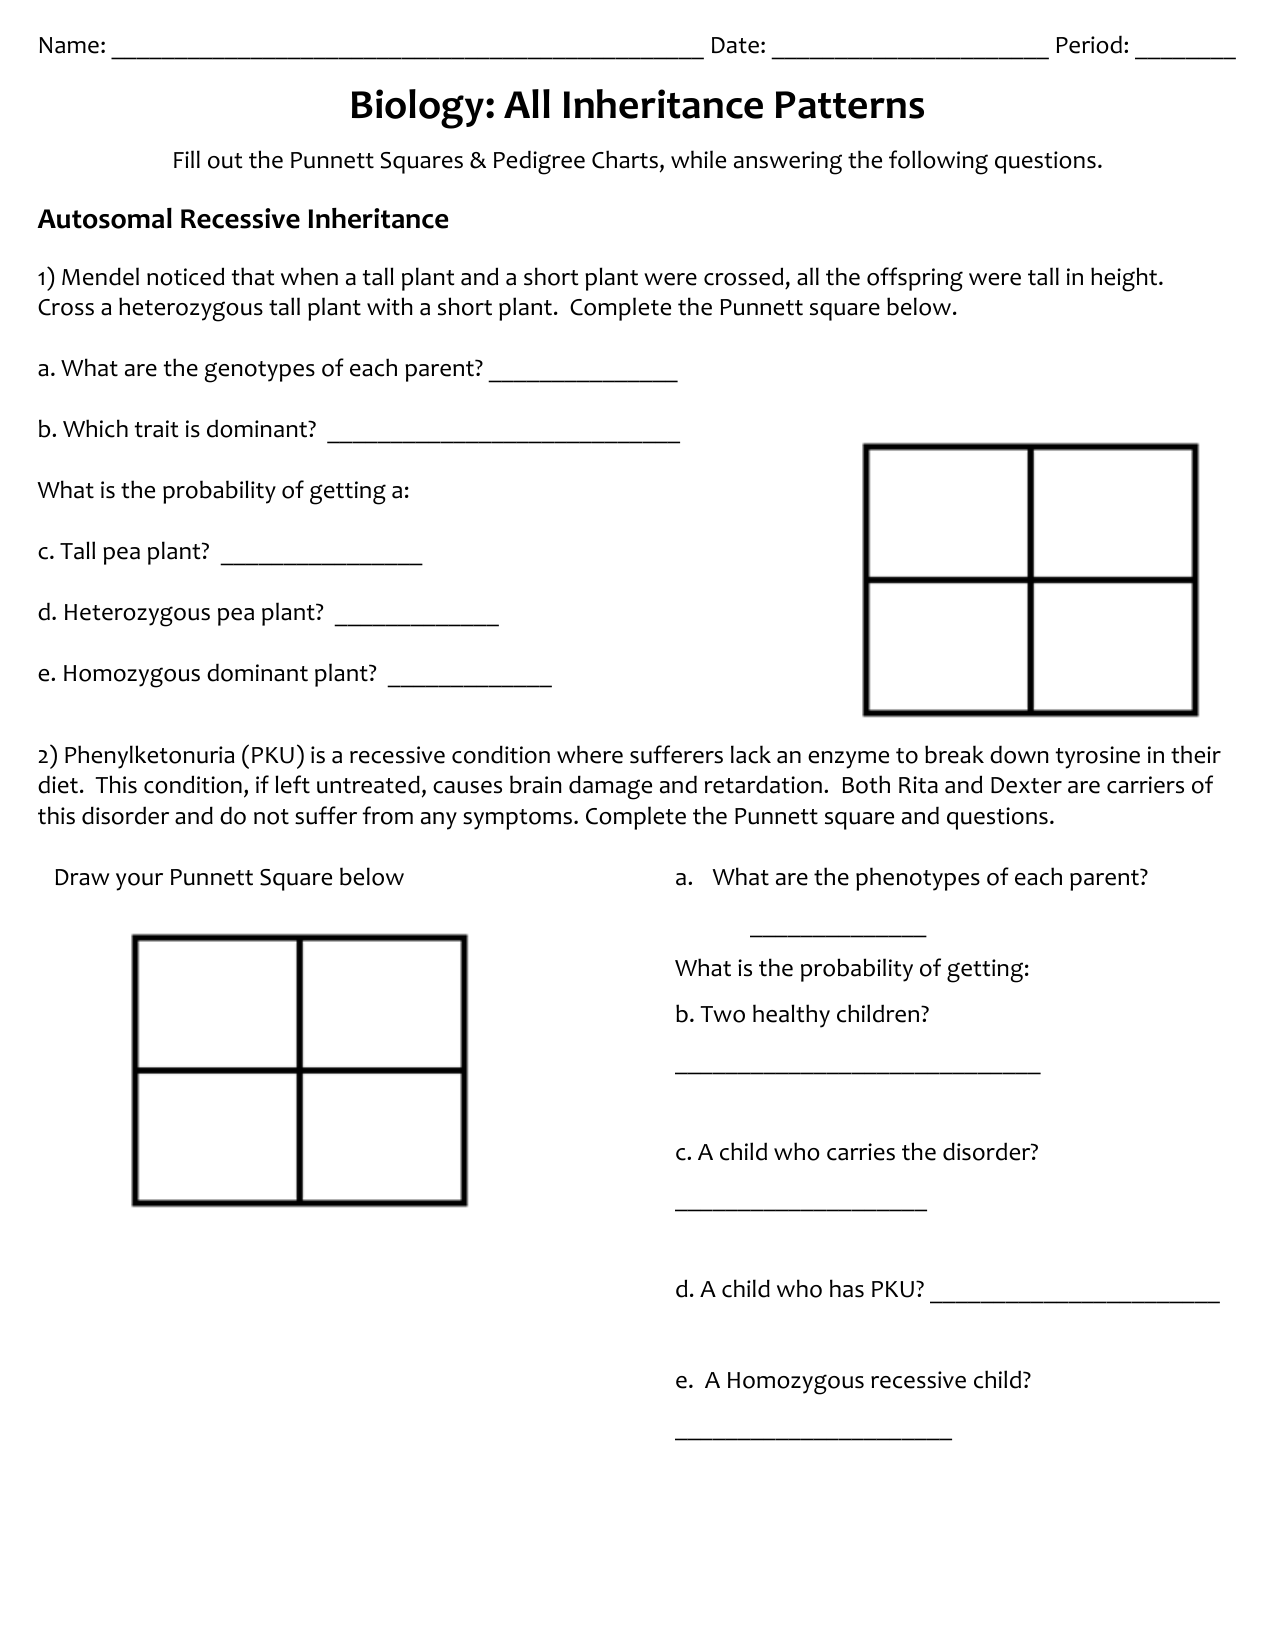 Pedigree Analysis Worksheet Answers / Pedigree Charts The ...